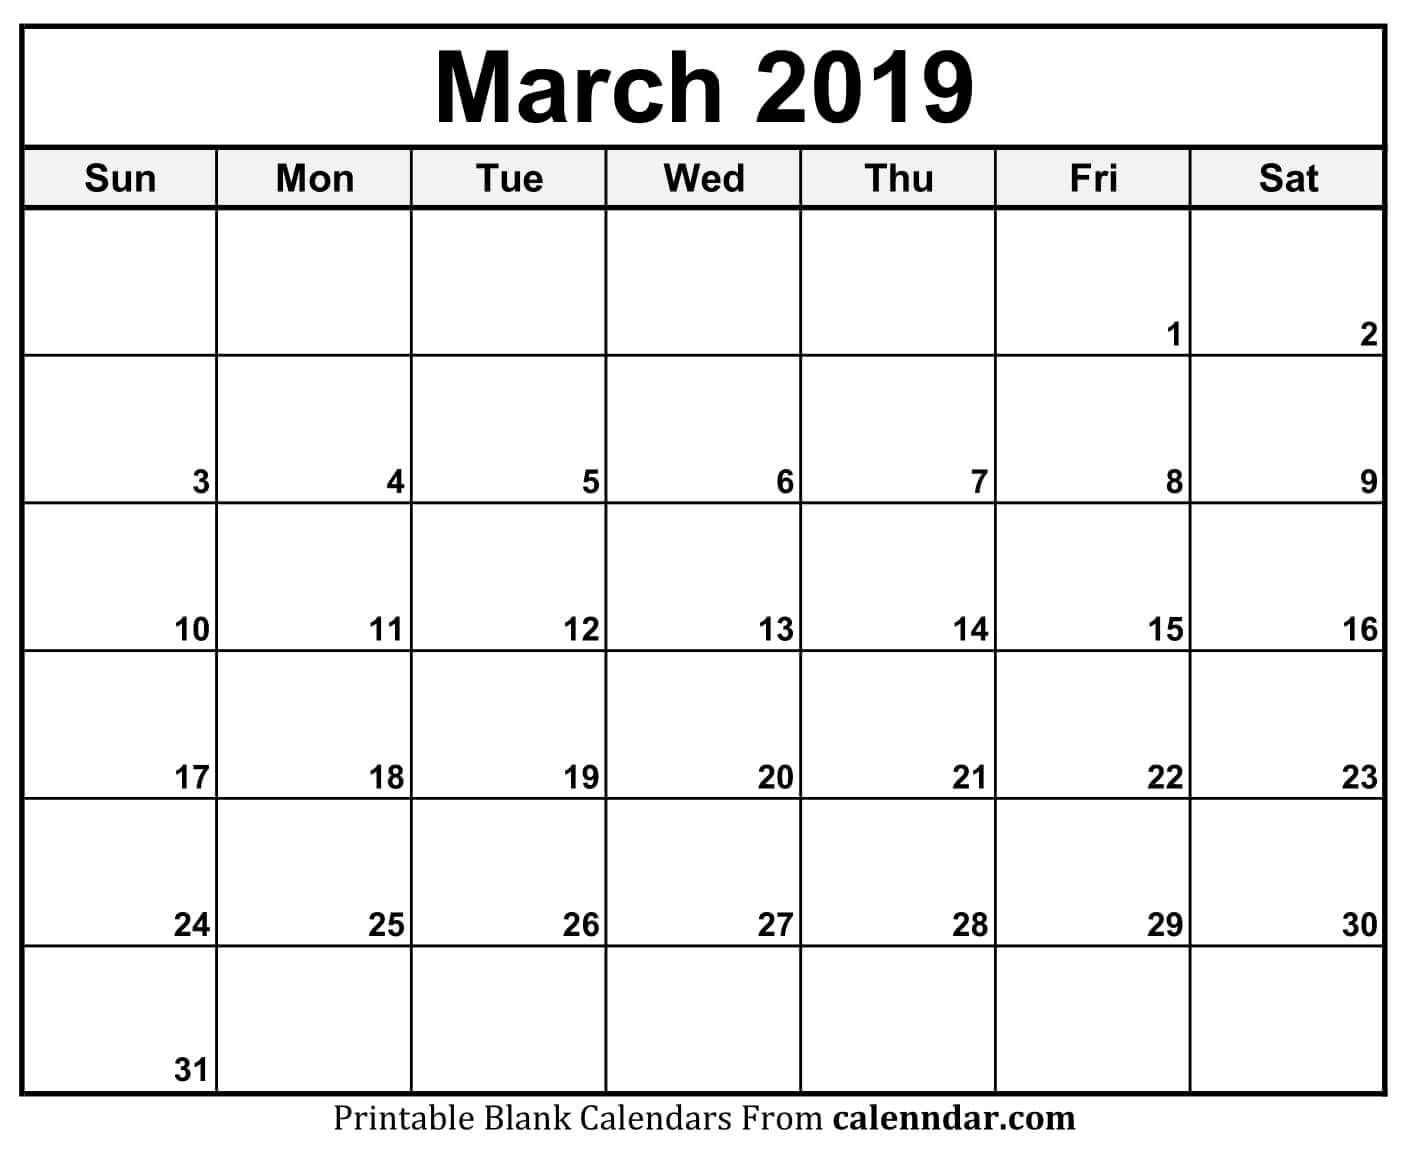 March Calendar 2019 11X17 #march #march2019Calendar